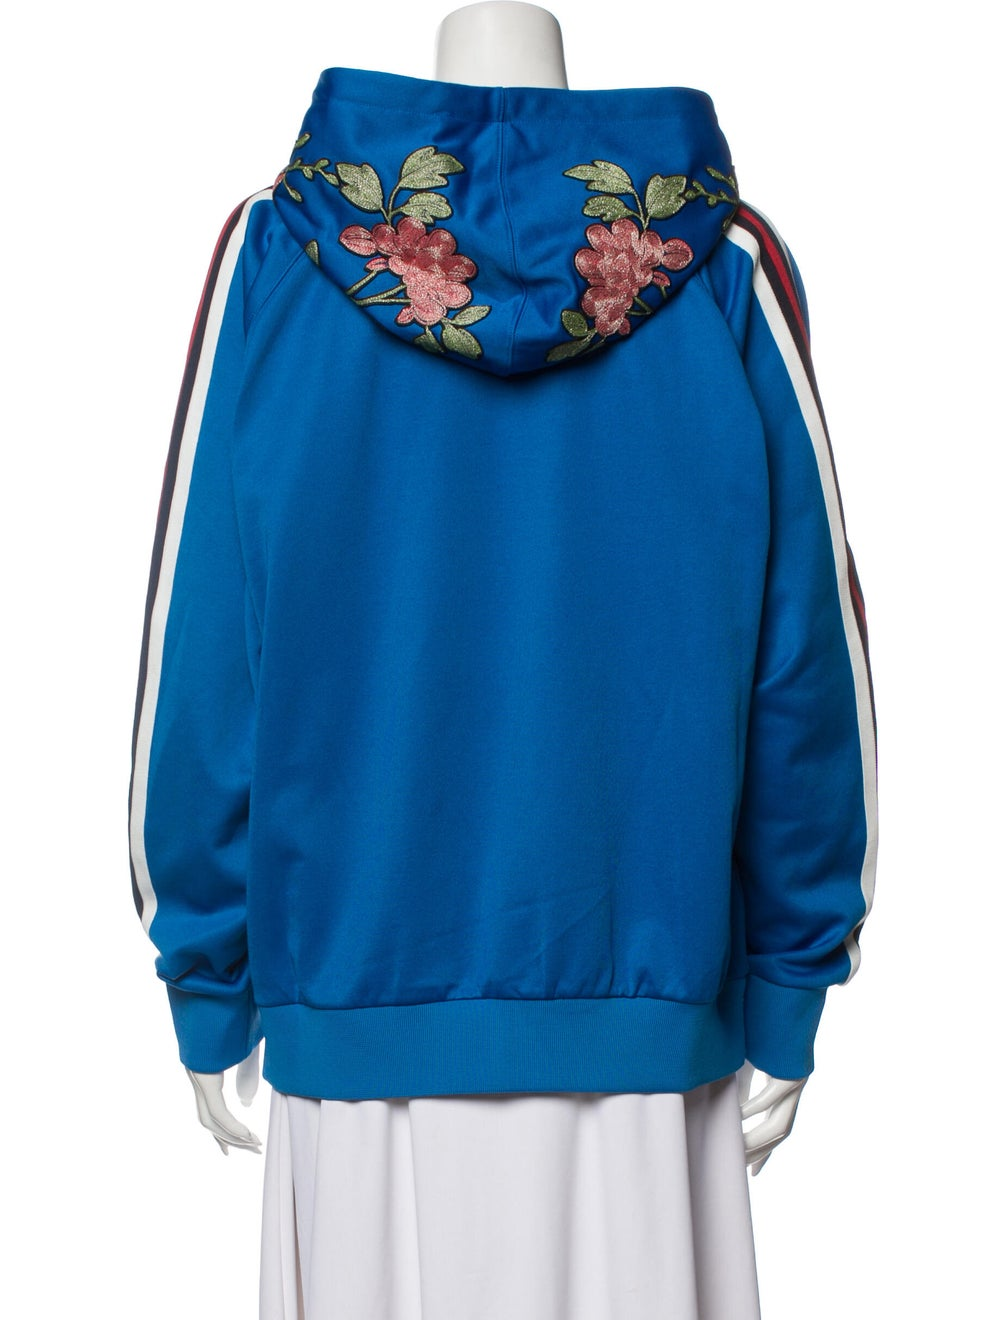 Gucci 2017 Floral Print Sweatshirt Sweatshirt Blue - image 3